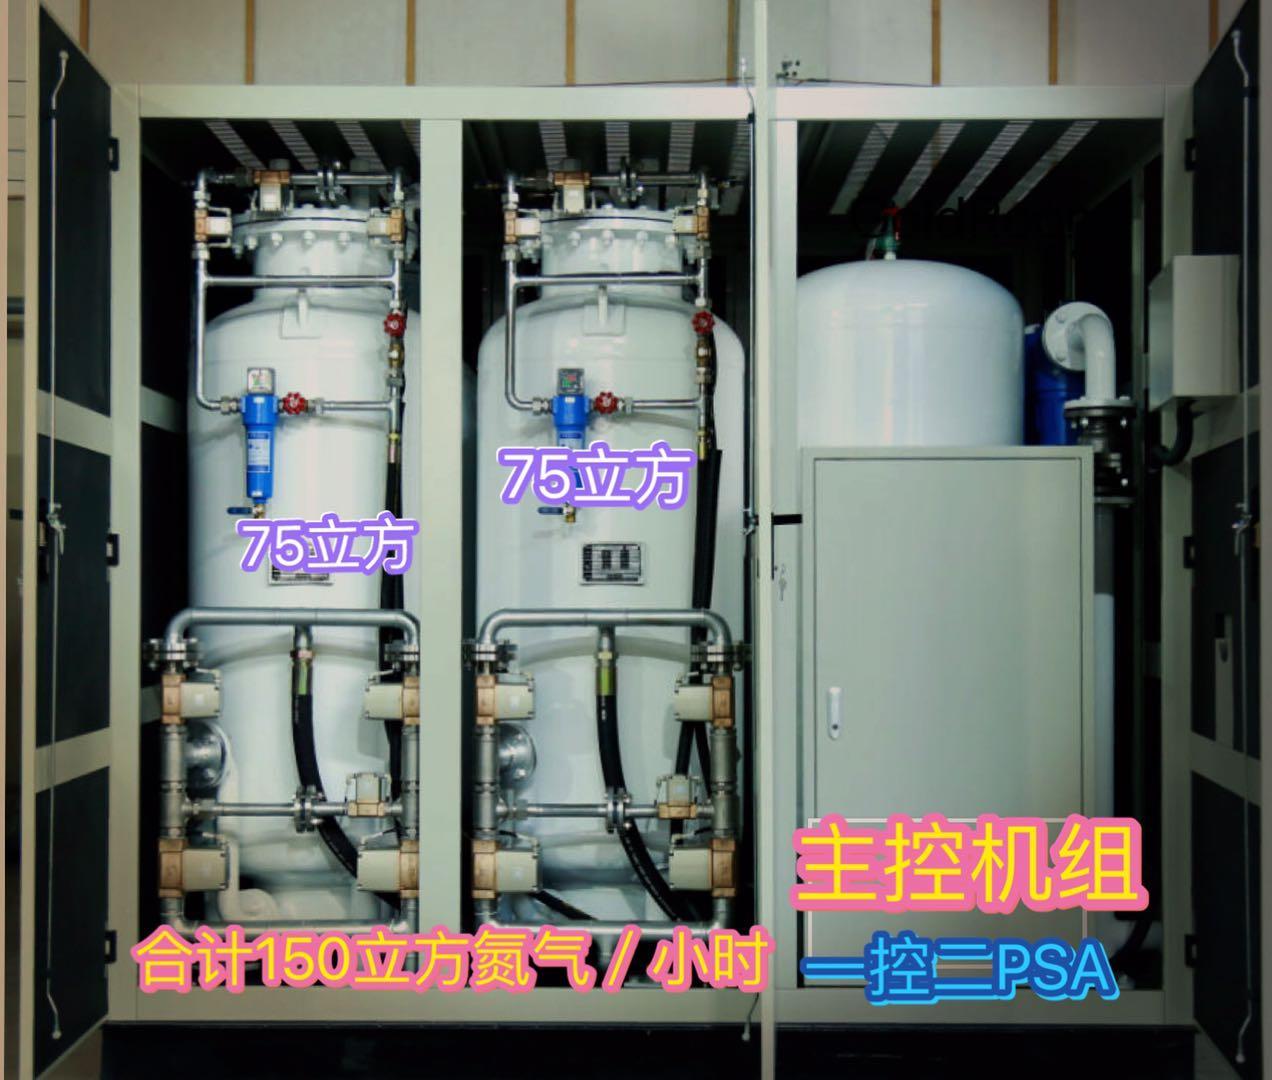 PSA type nitrogen generator